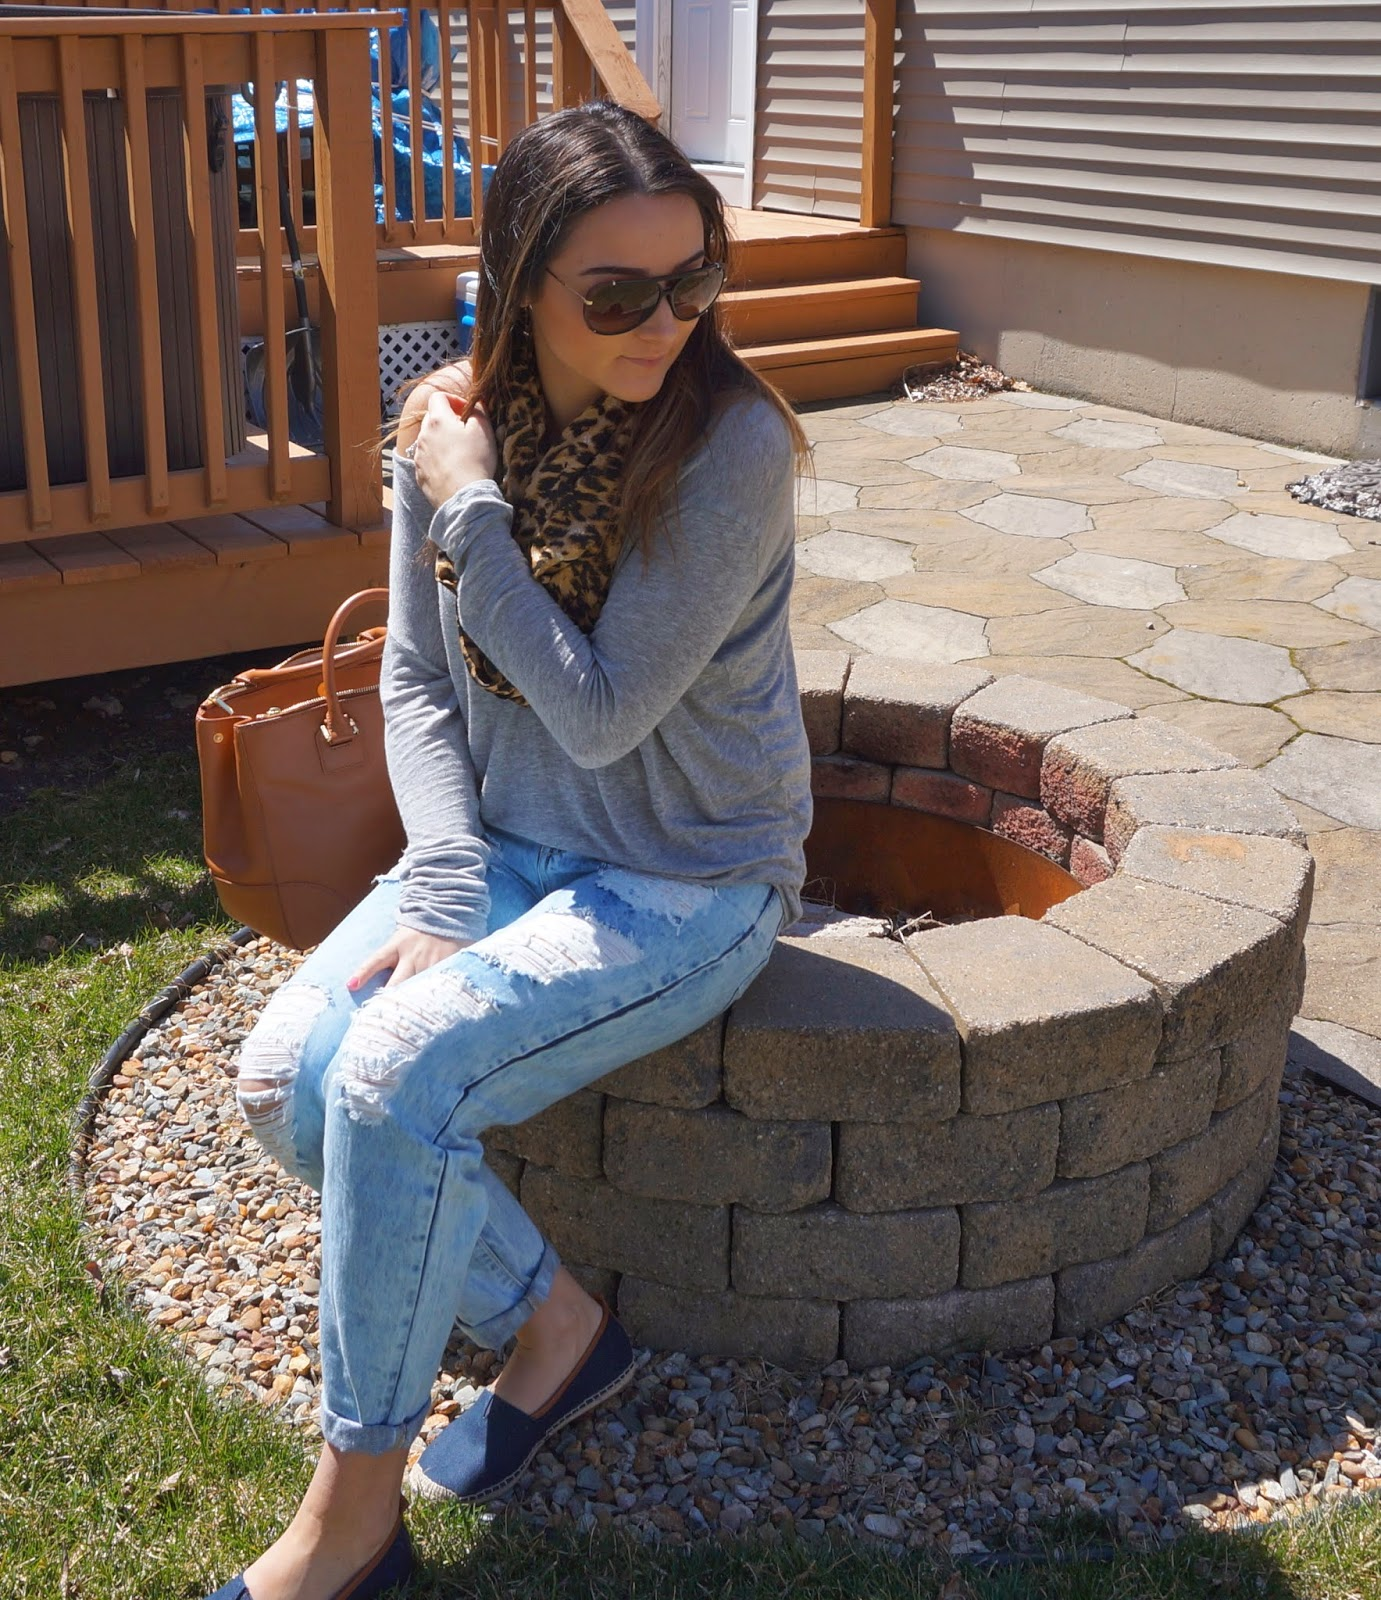 f882db50a04 Michael Kors Shoes  Nordstrom Rack Purse  Tory Burch Sunglasses  Michael  Kors